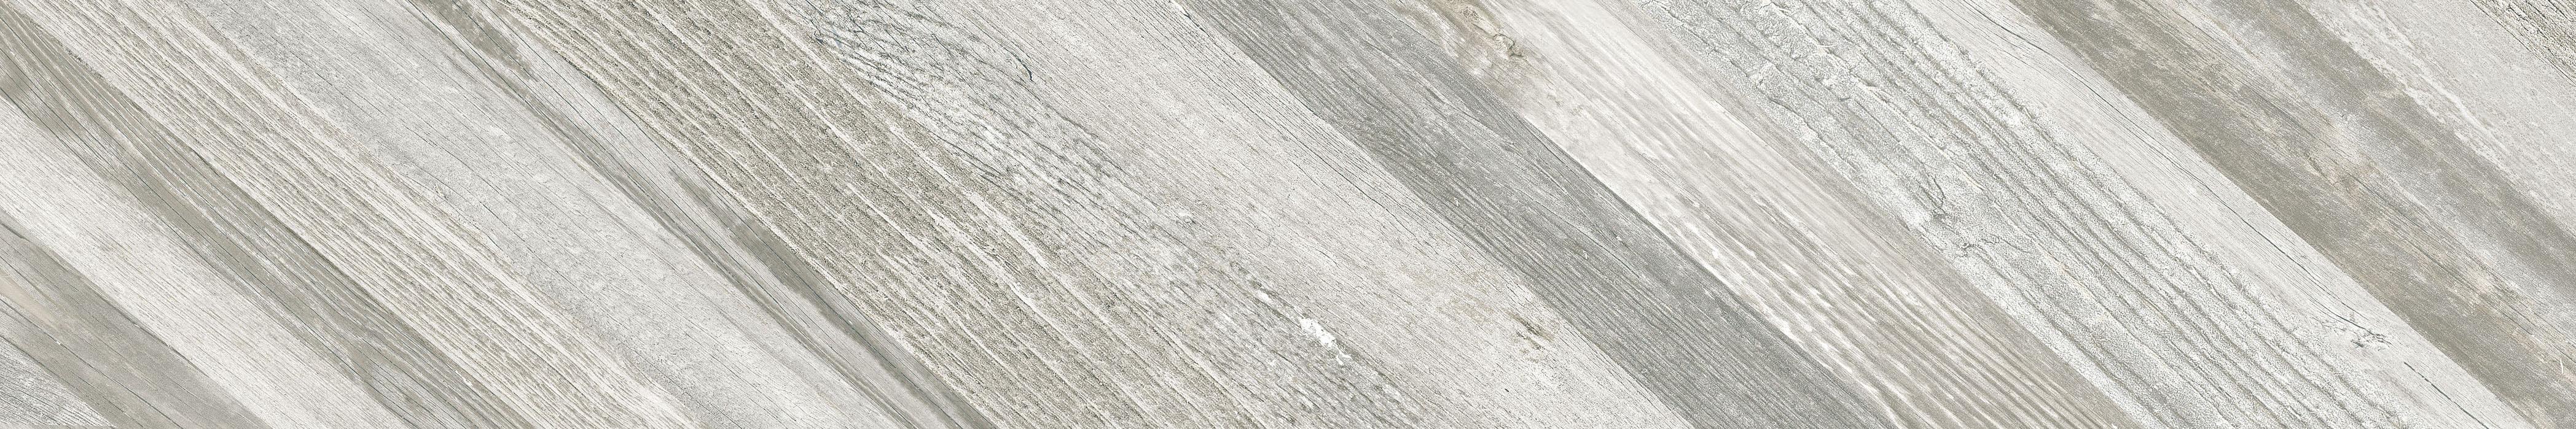 0591247, Artwood, Vaaleanharmaa, lattia,pakkasenkesto,liukastumisenesto